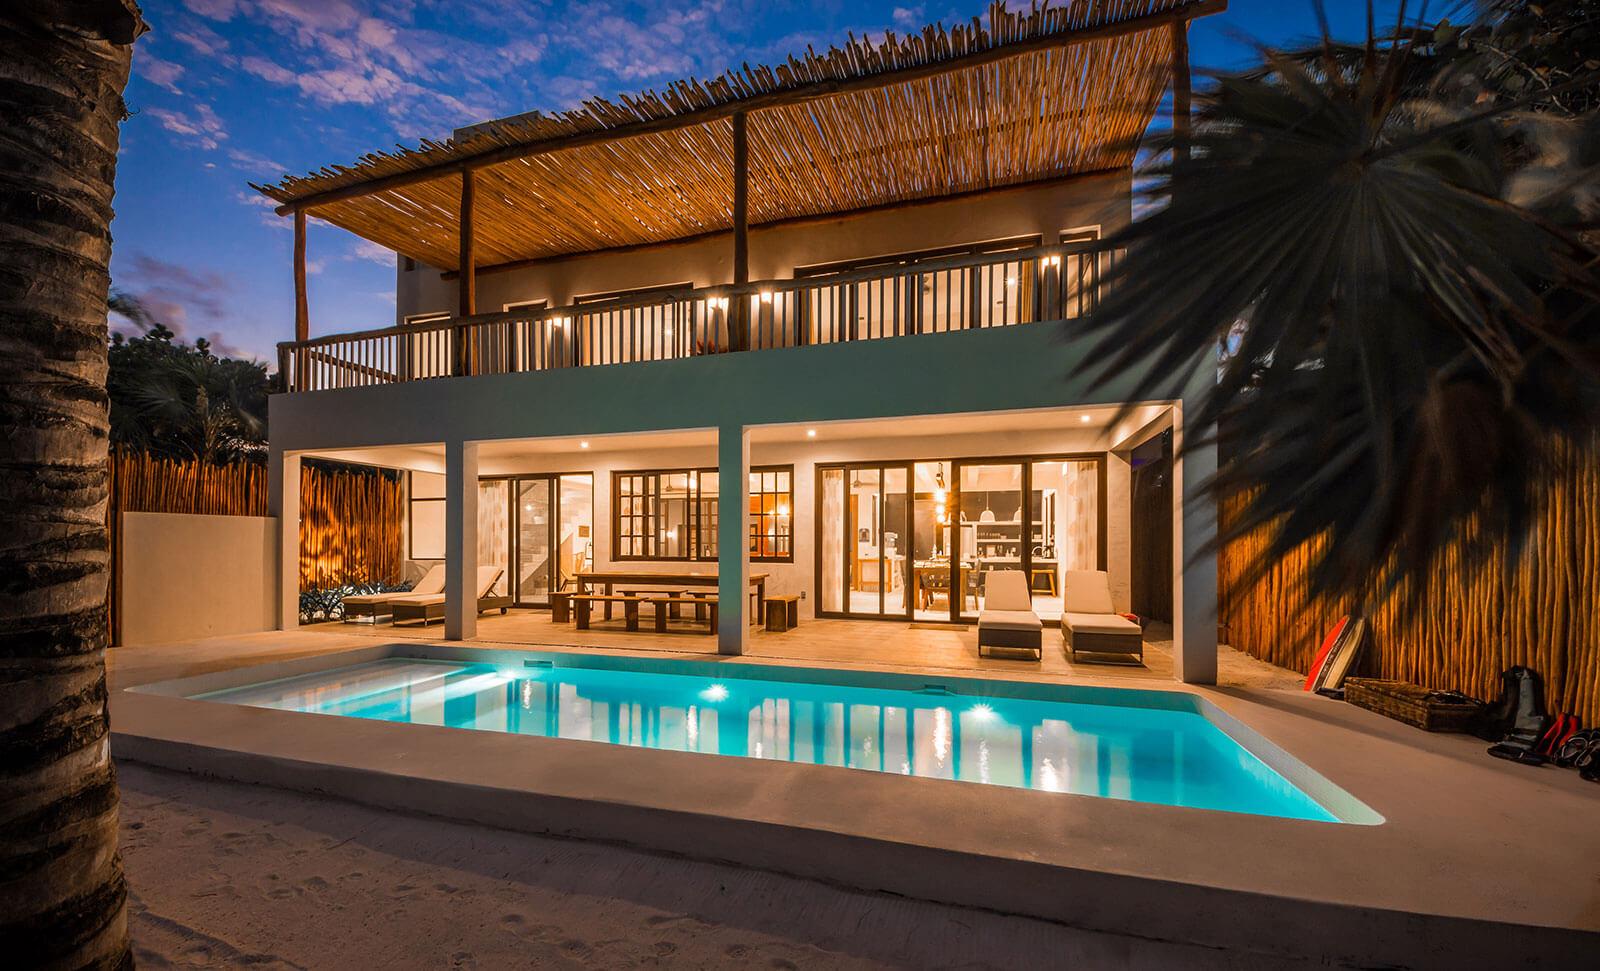 Maya_Luxe_Riviera_Maya_Luxury_Villas_Experiences_Tulum_Soliman_Bay_5_Bedrooms_43.jpg